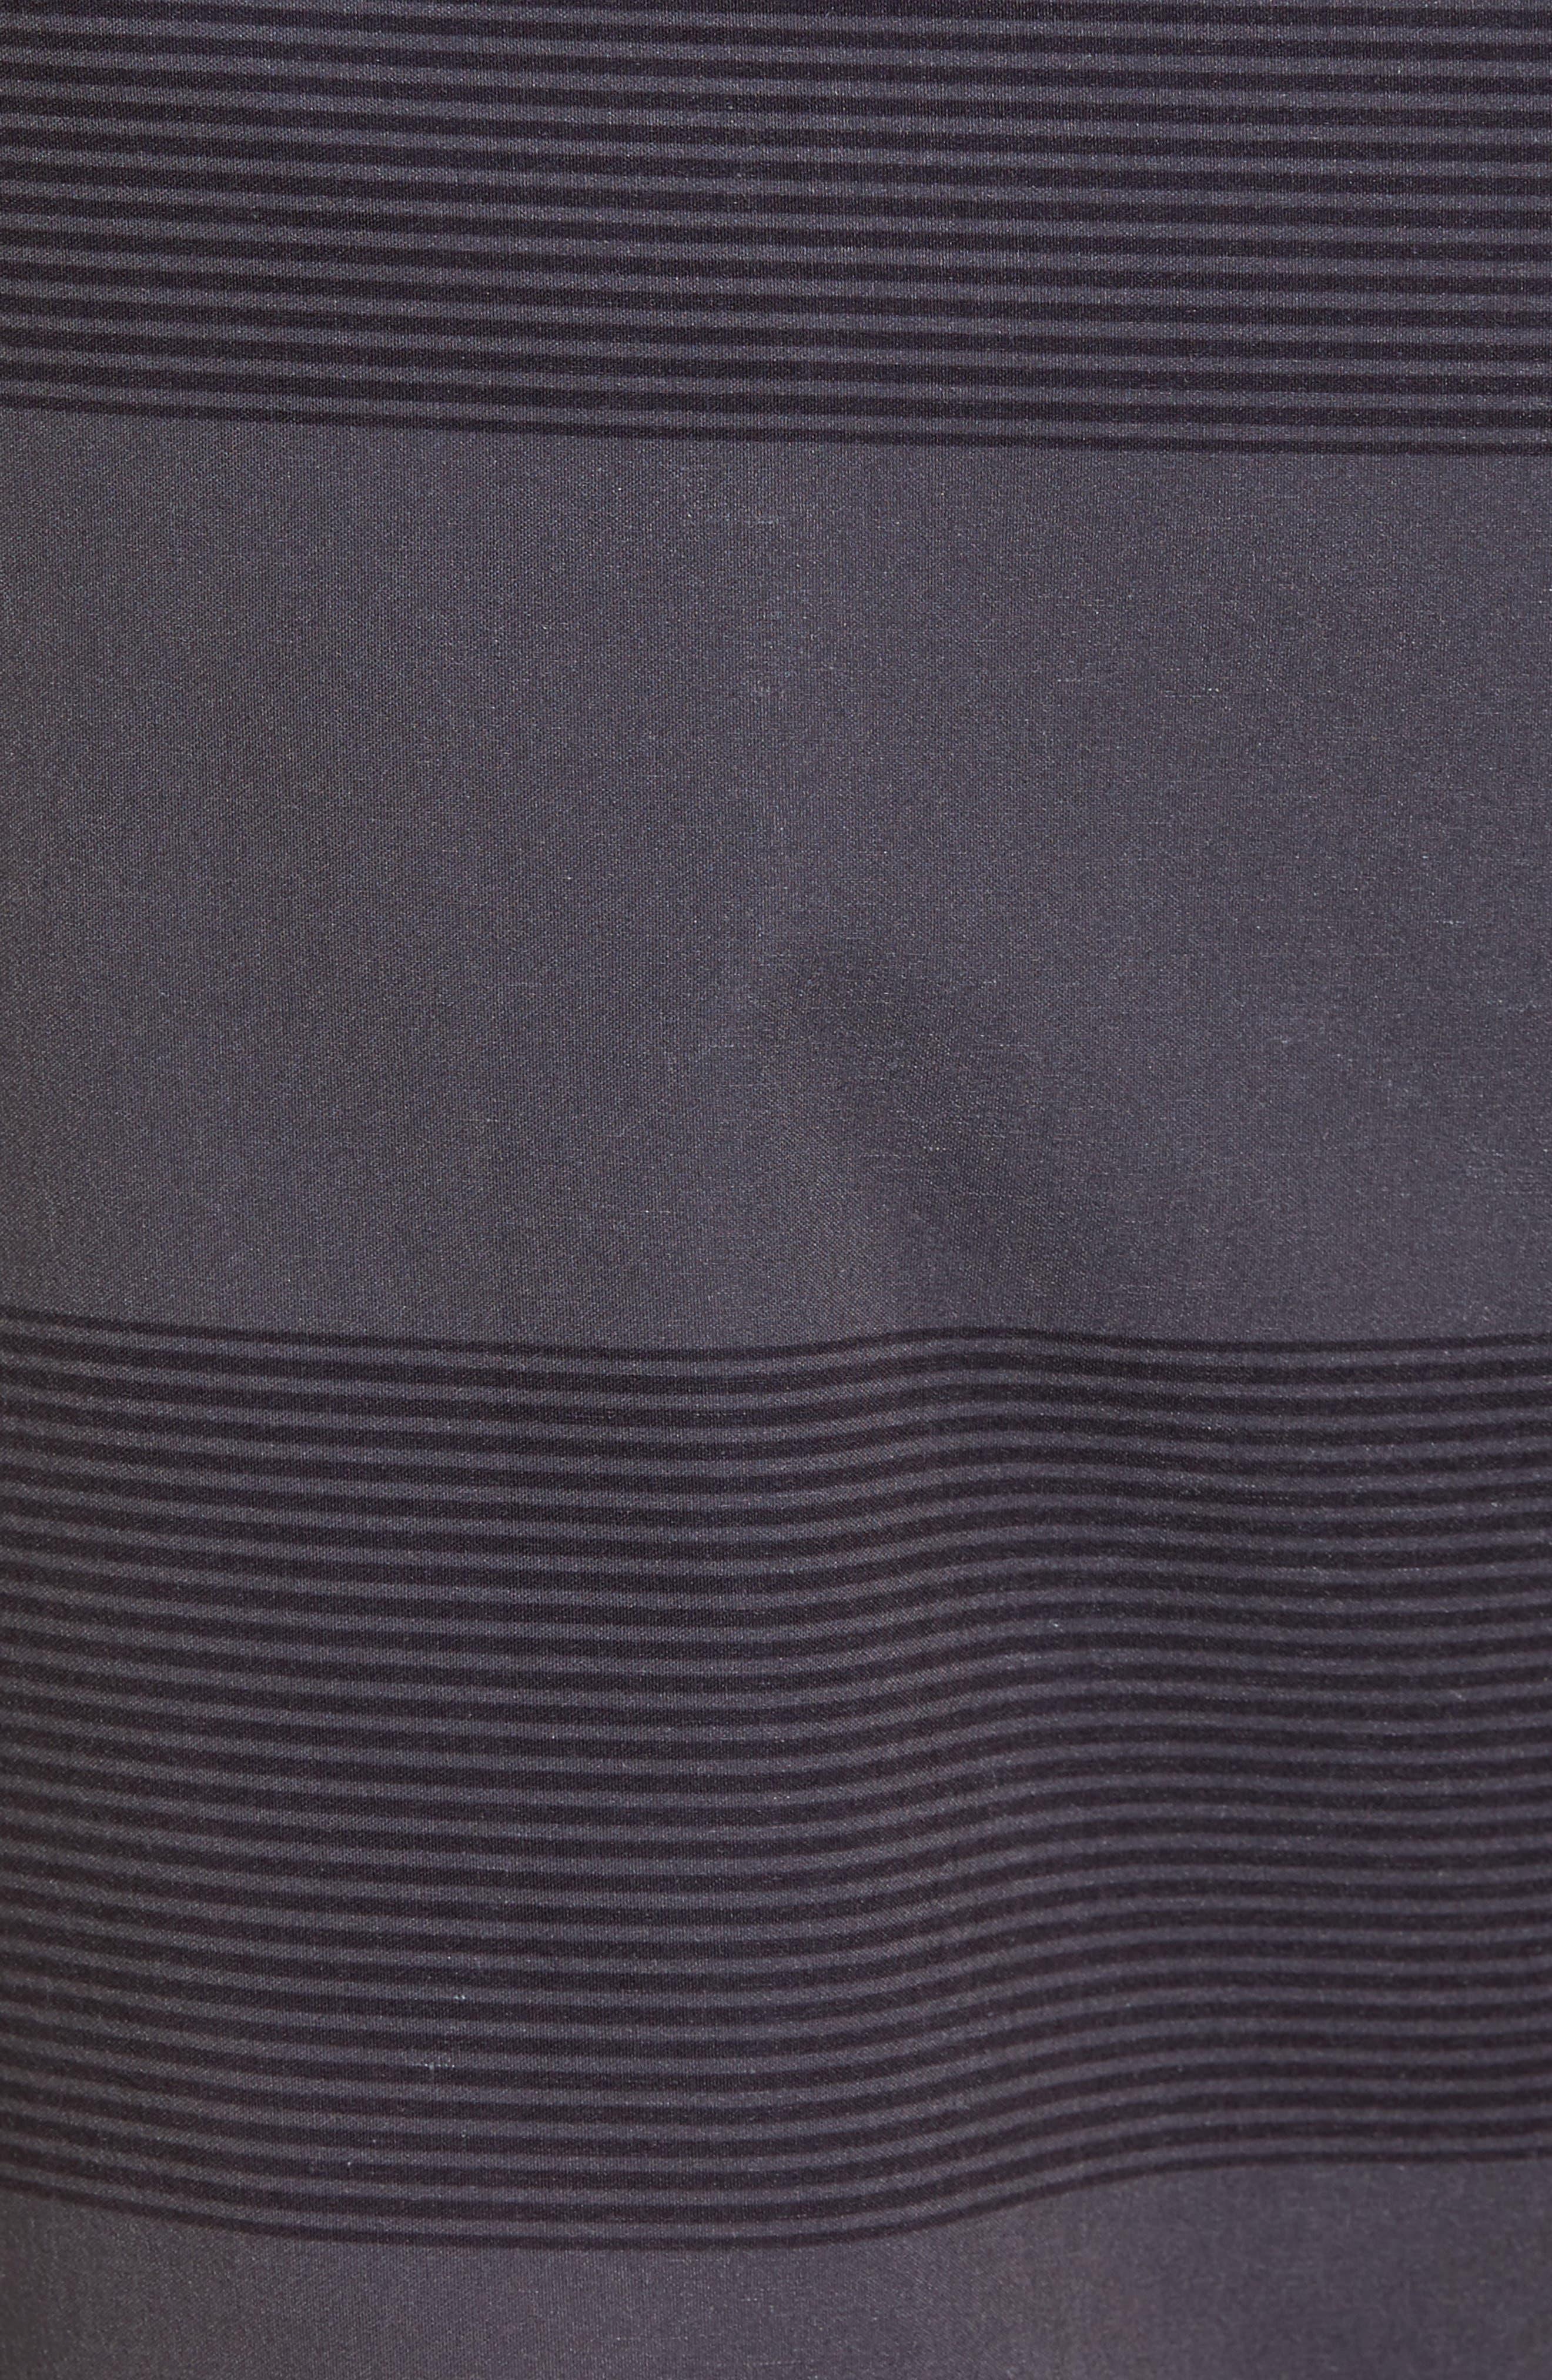 Banks Performance Hybrid Shorts,                             Alternate thumbnail 5, color,                             021